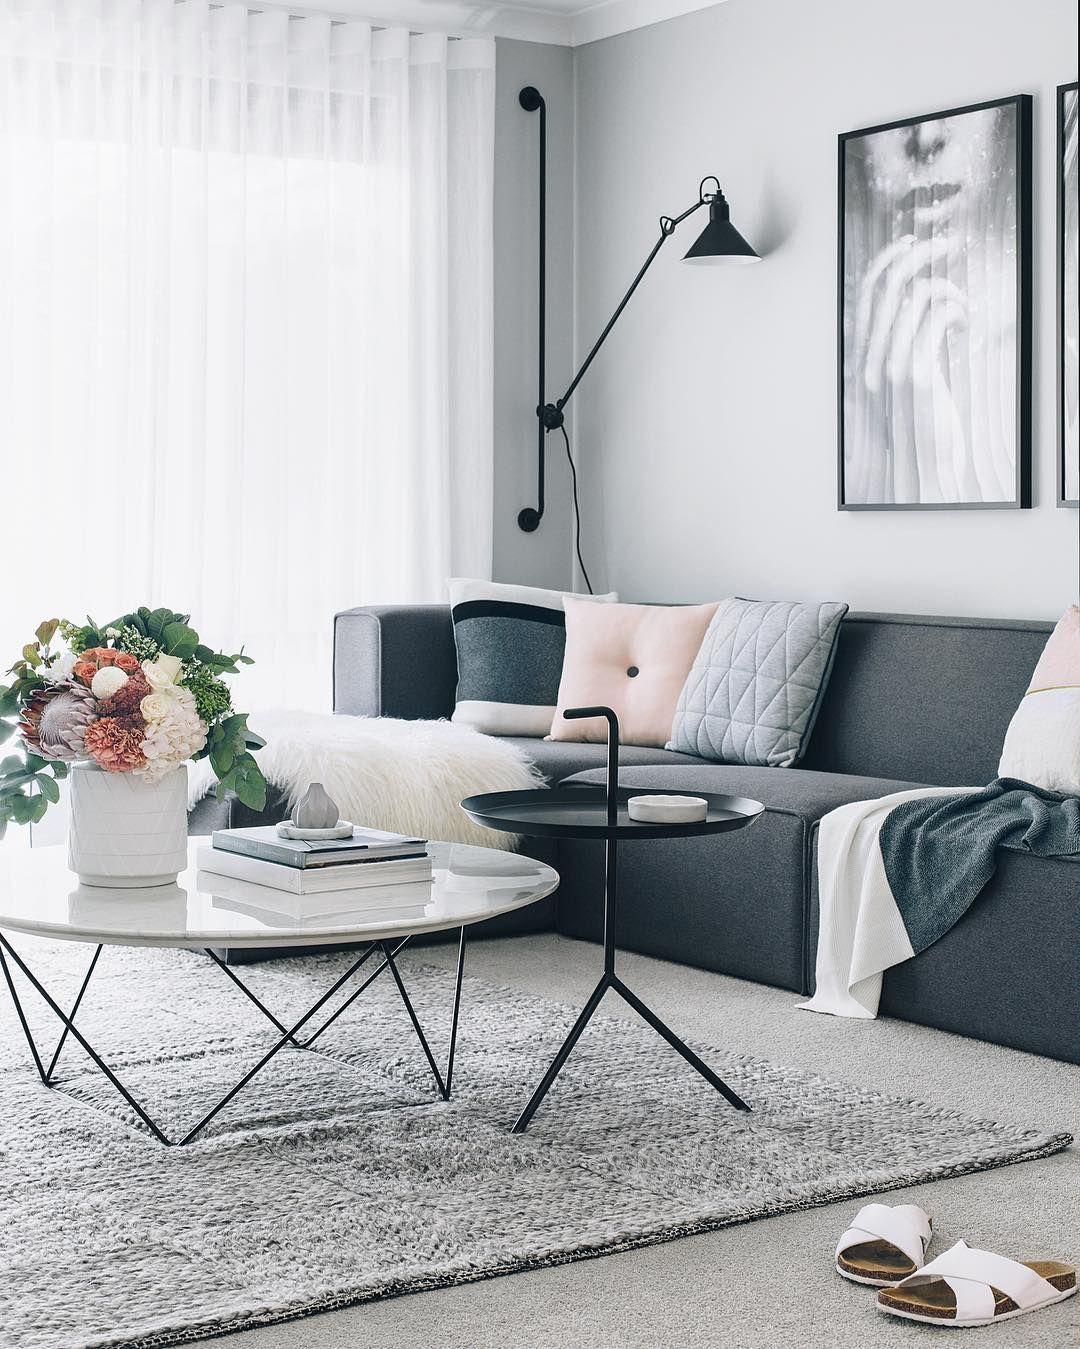 modern interior design ideas for family homes dark sofa pink